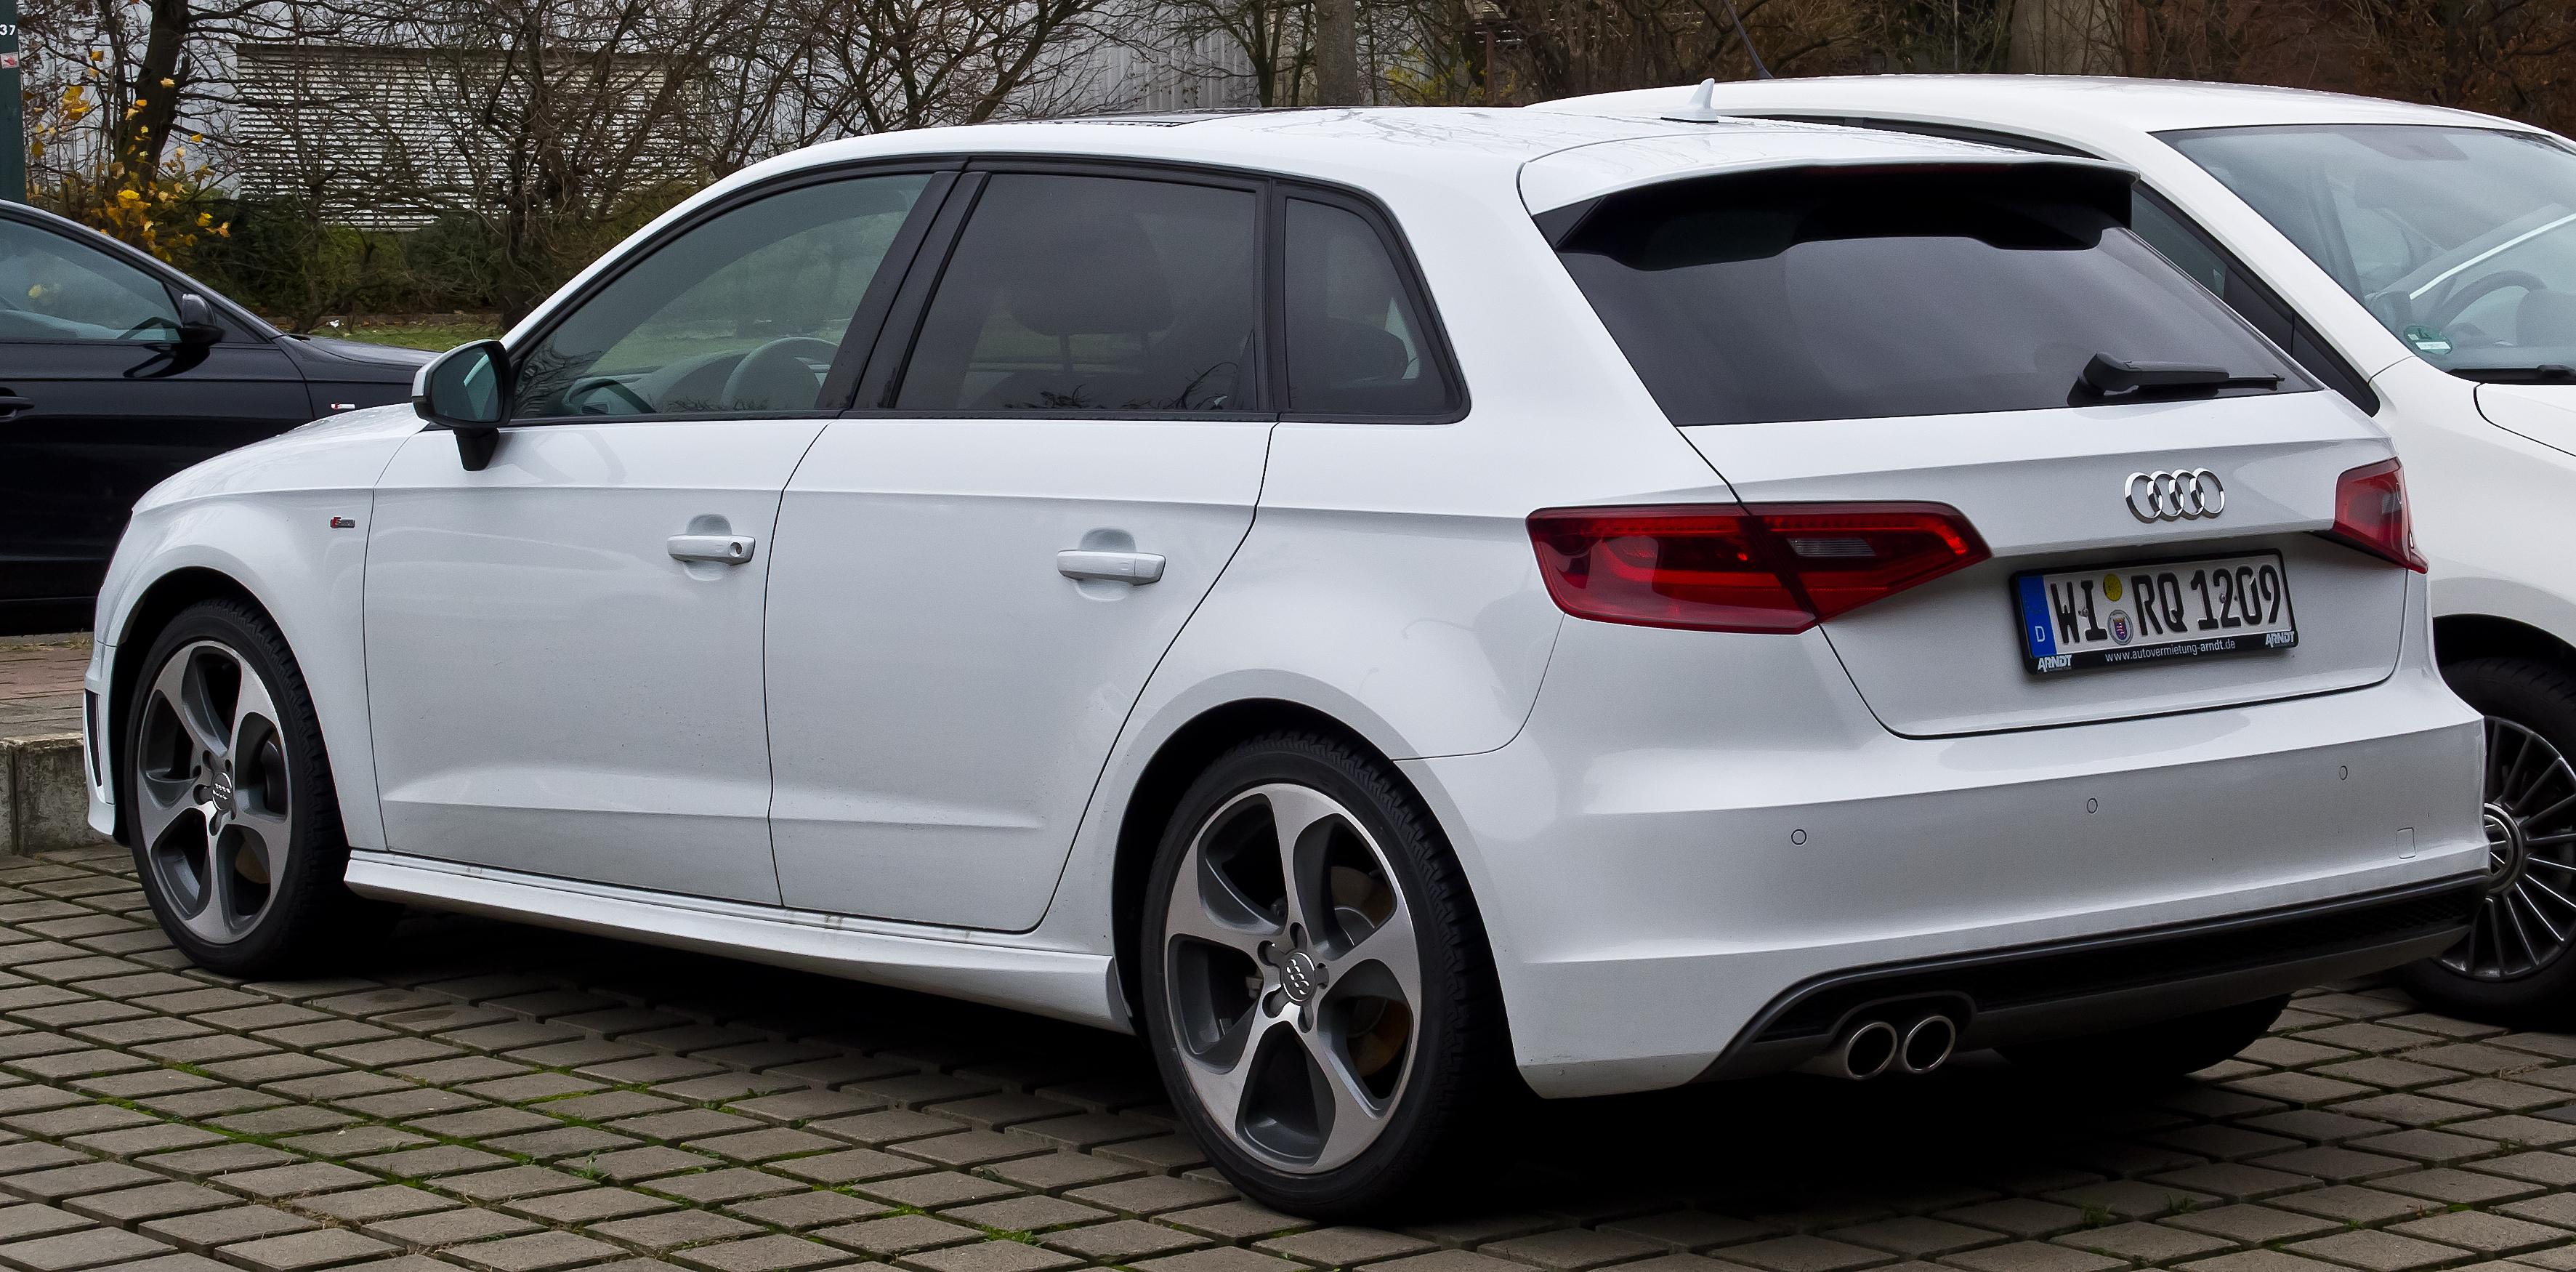 Audi Build Your Own >> File:Audi A3 Sportback S-line (8V) – Heckansicht, 21. Dezember 2014, Düsseldorf.jpg - Wikimedia ...